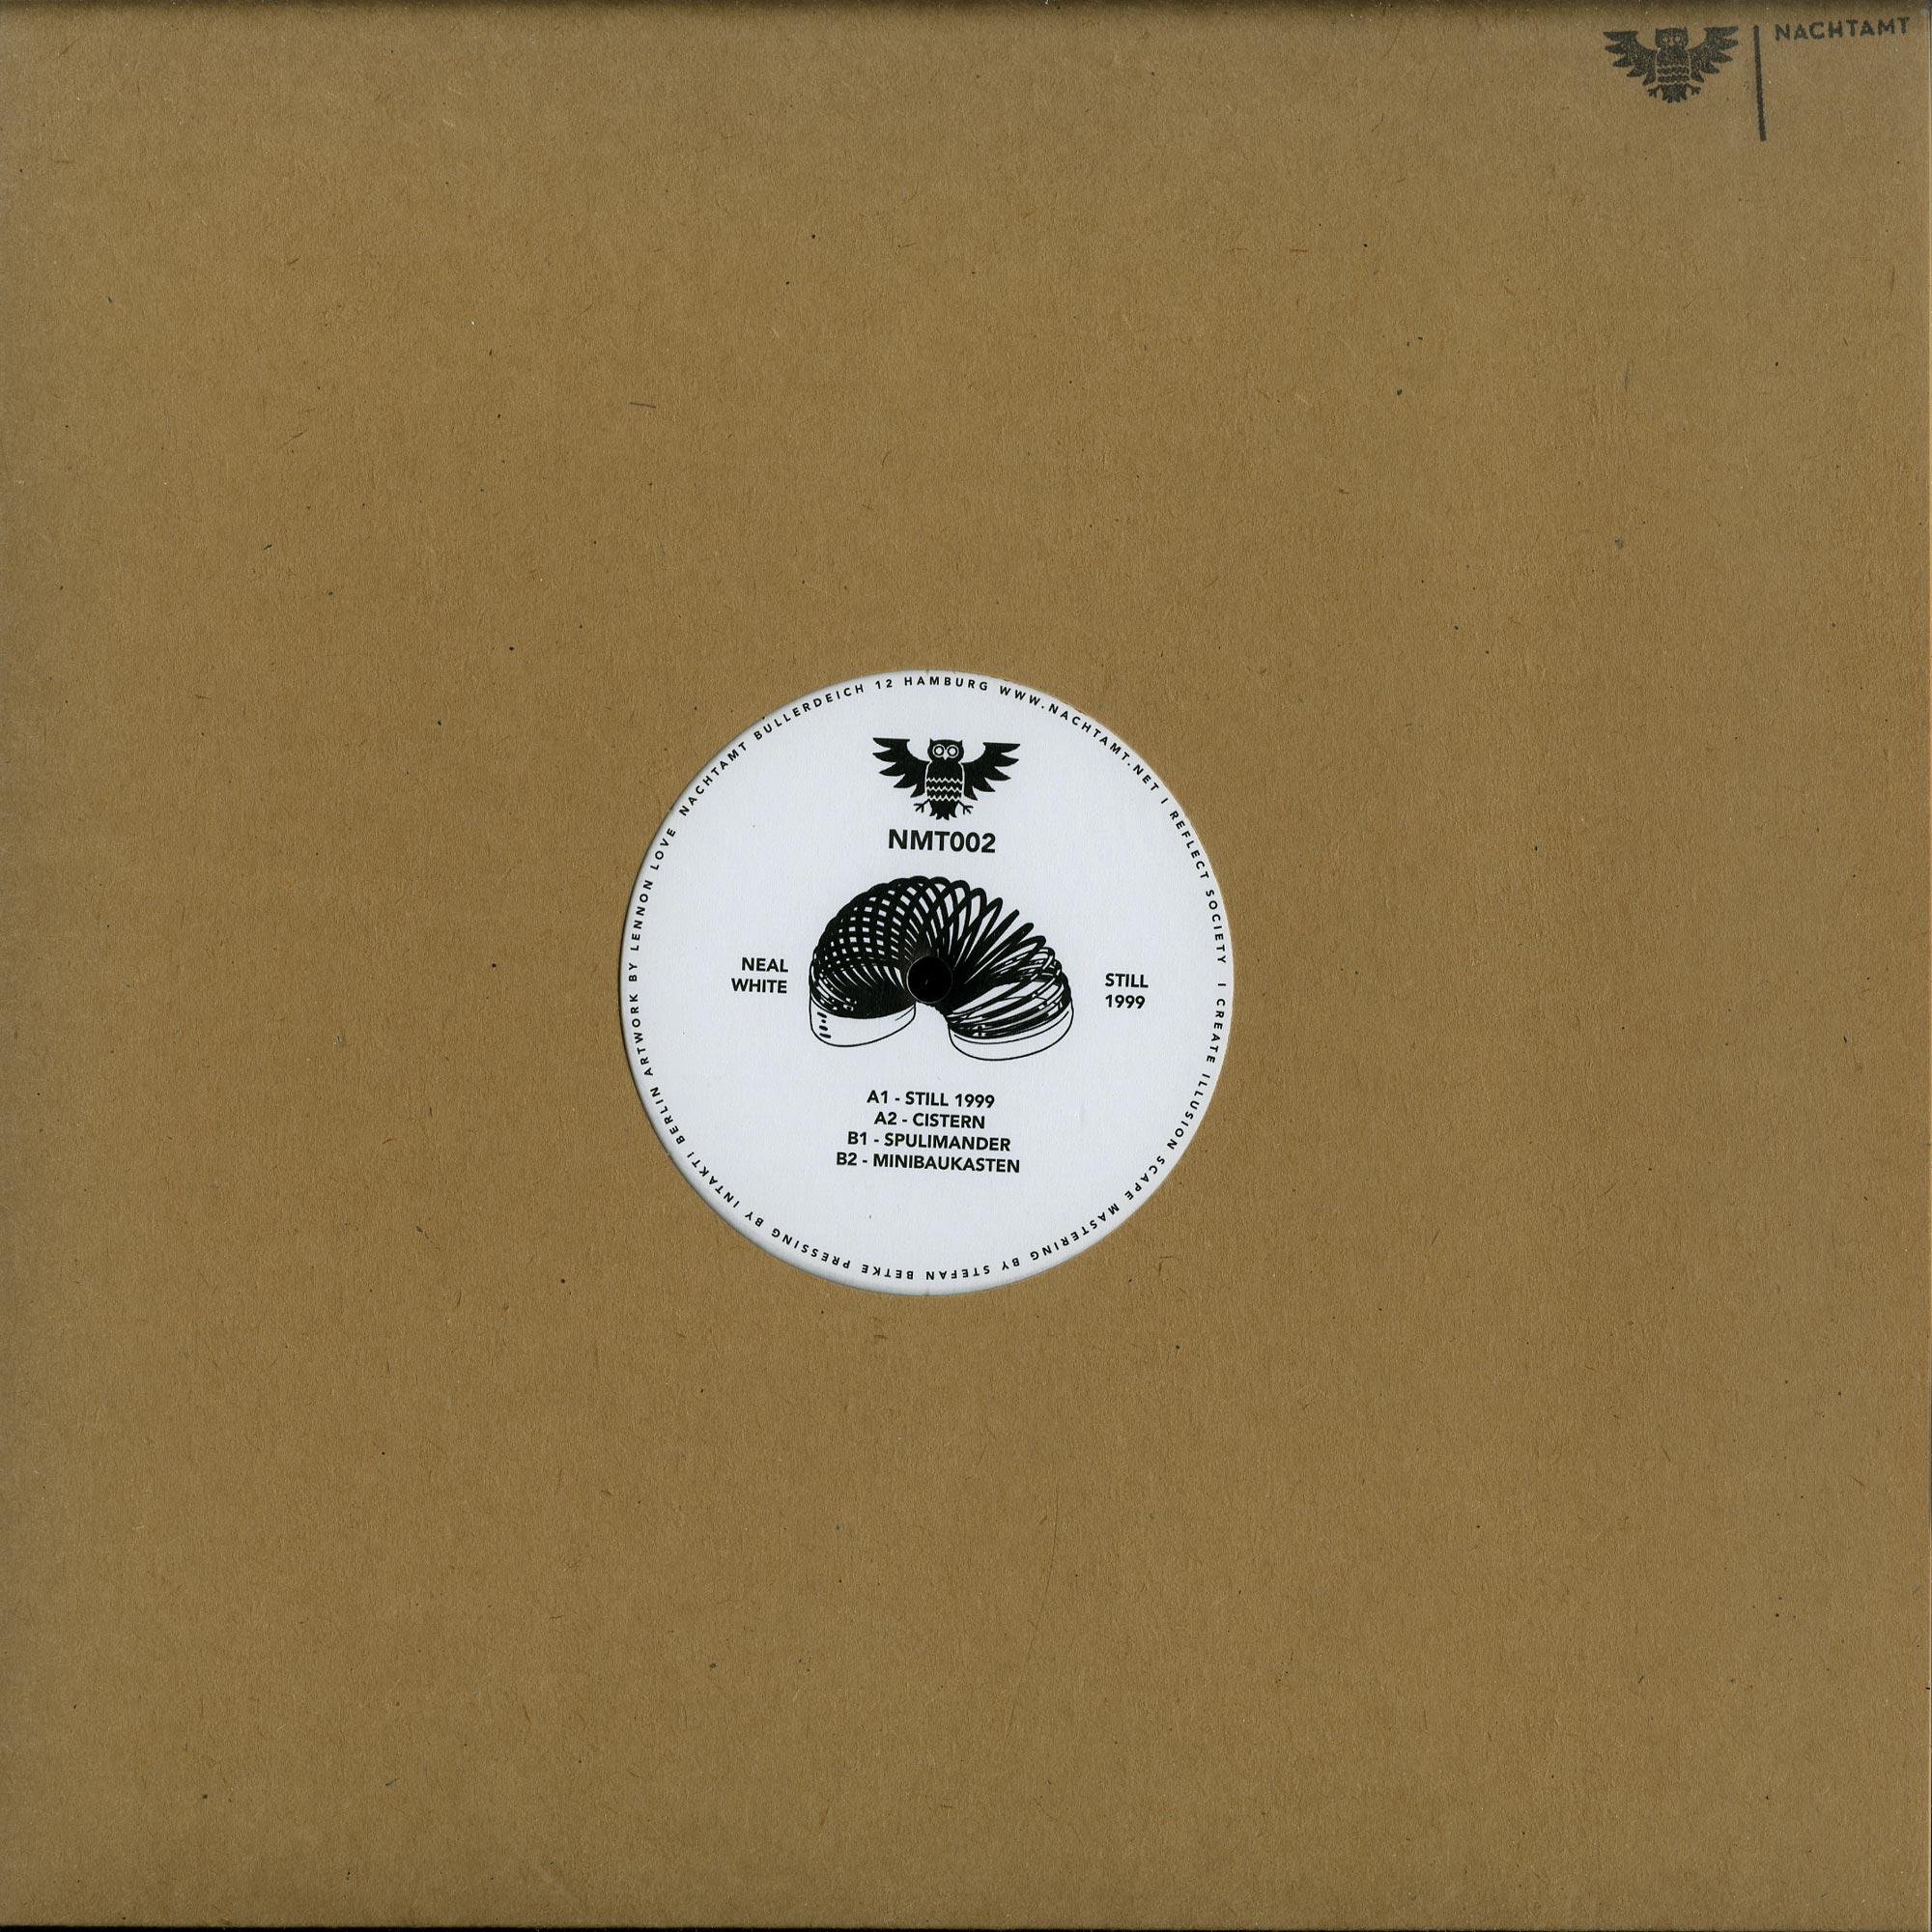 Neal White - Still 1999